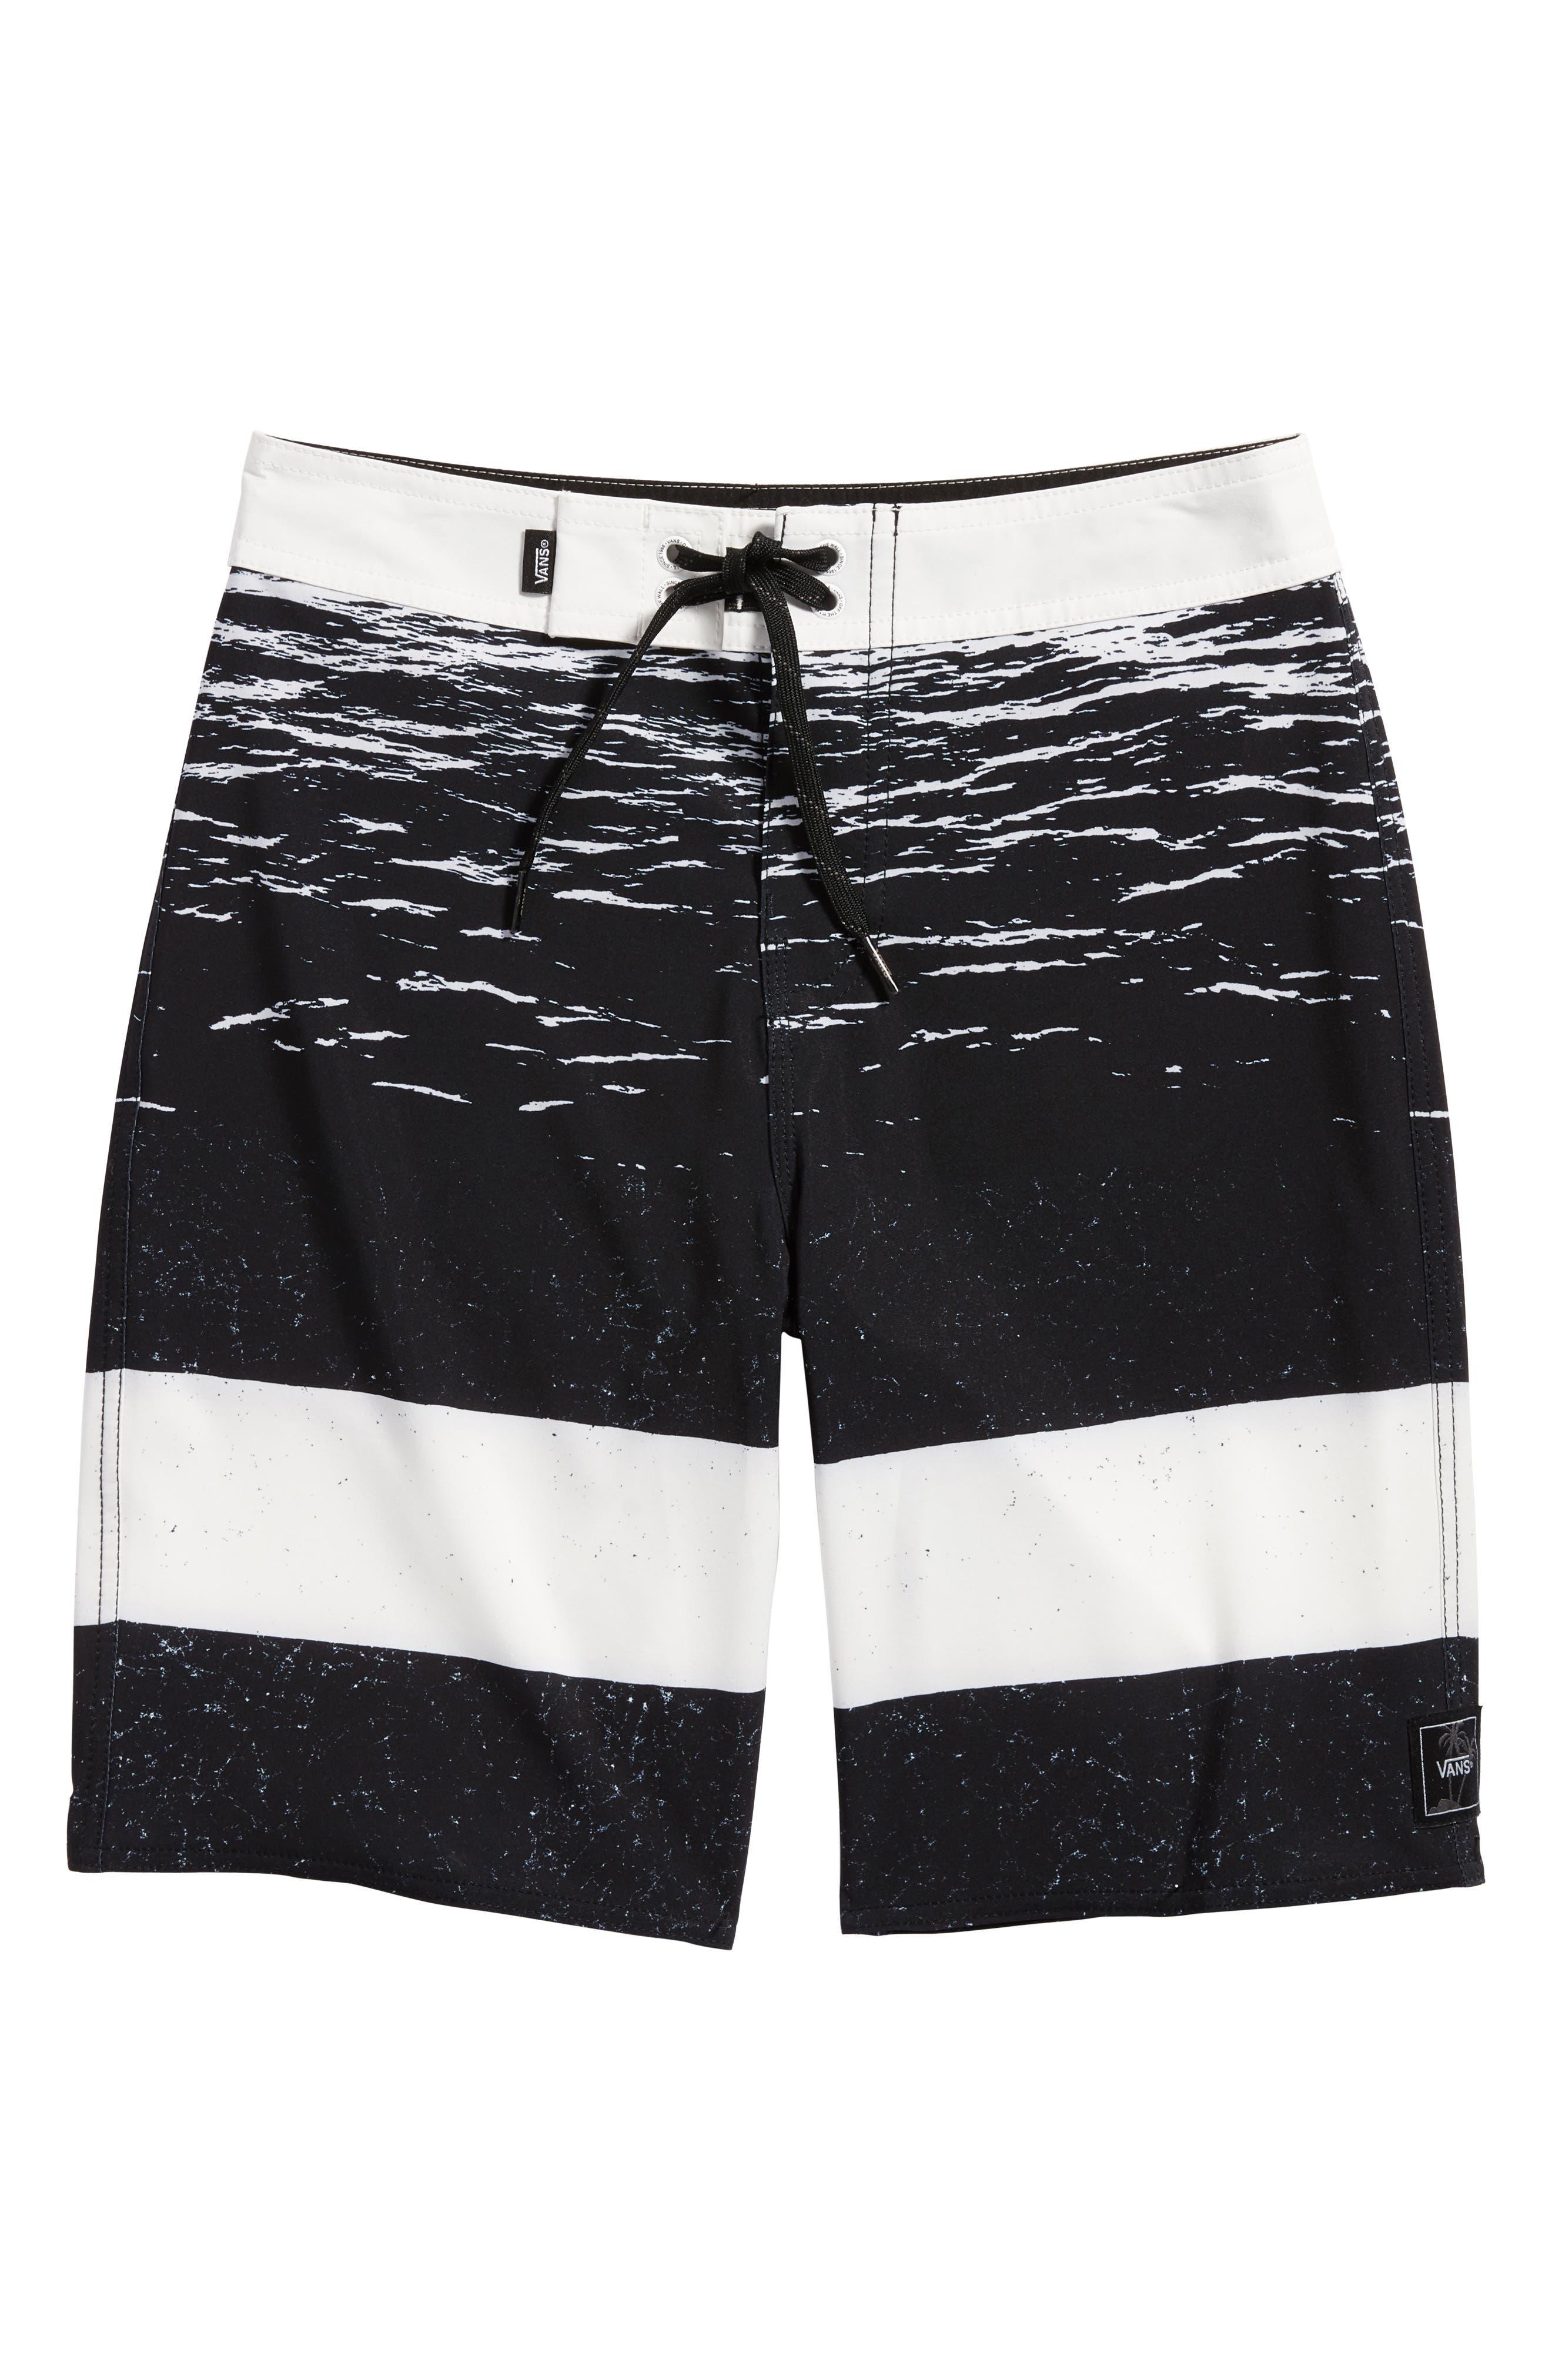 Era Board Shorts,                             Main thumbnail 1, color,                             White Dark Water